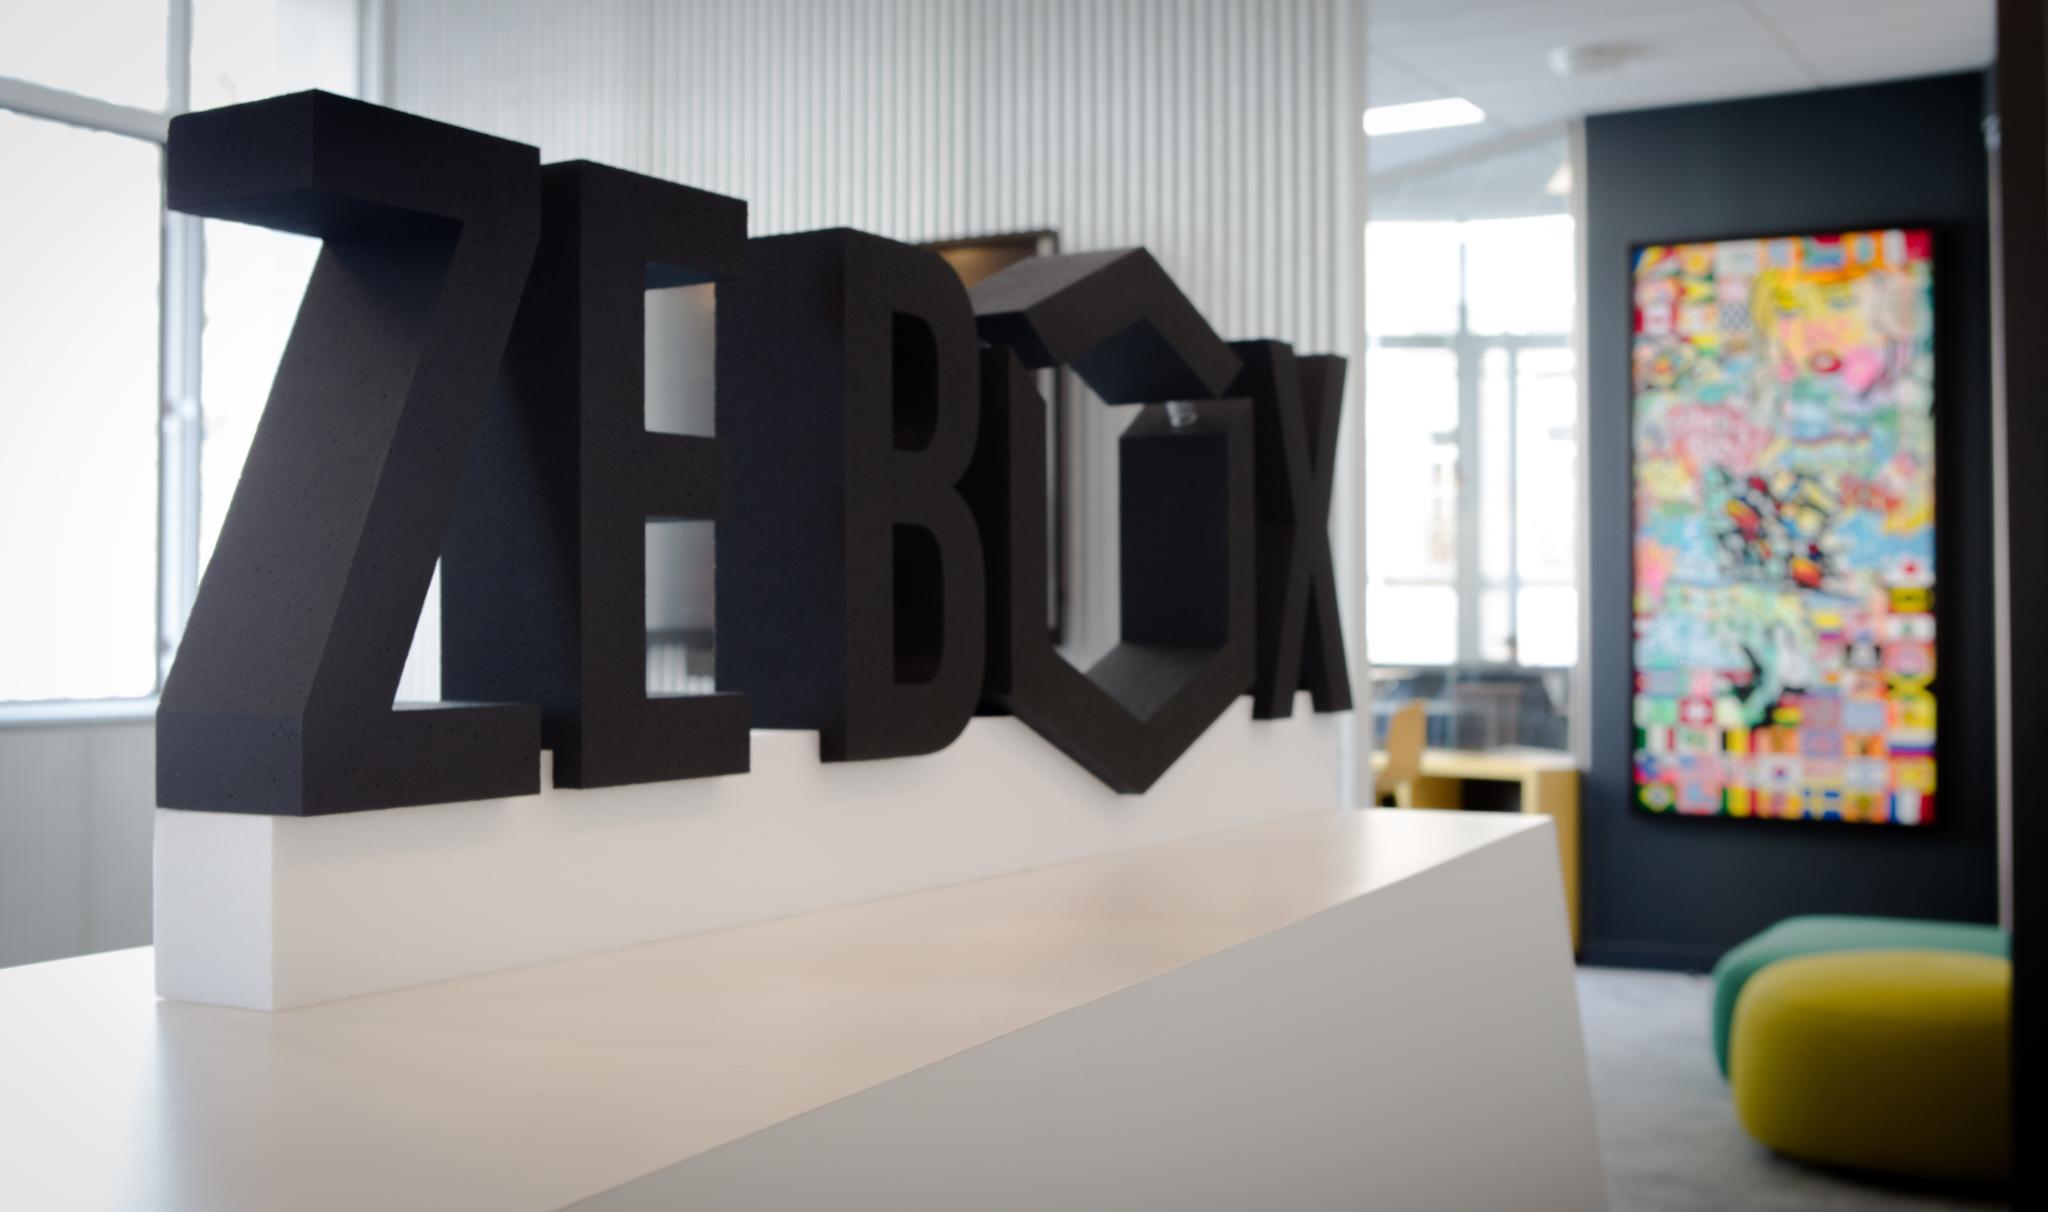 Zebox locaux